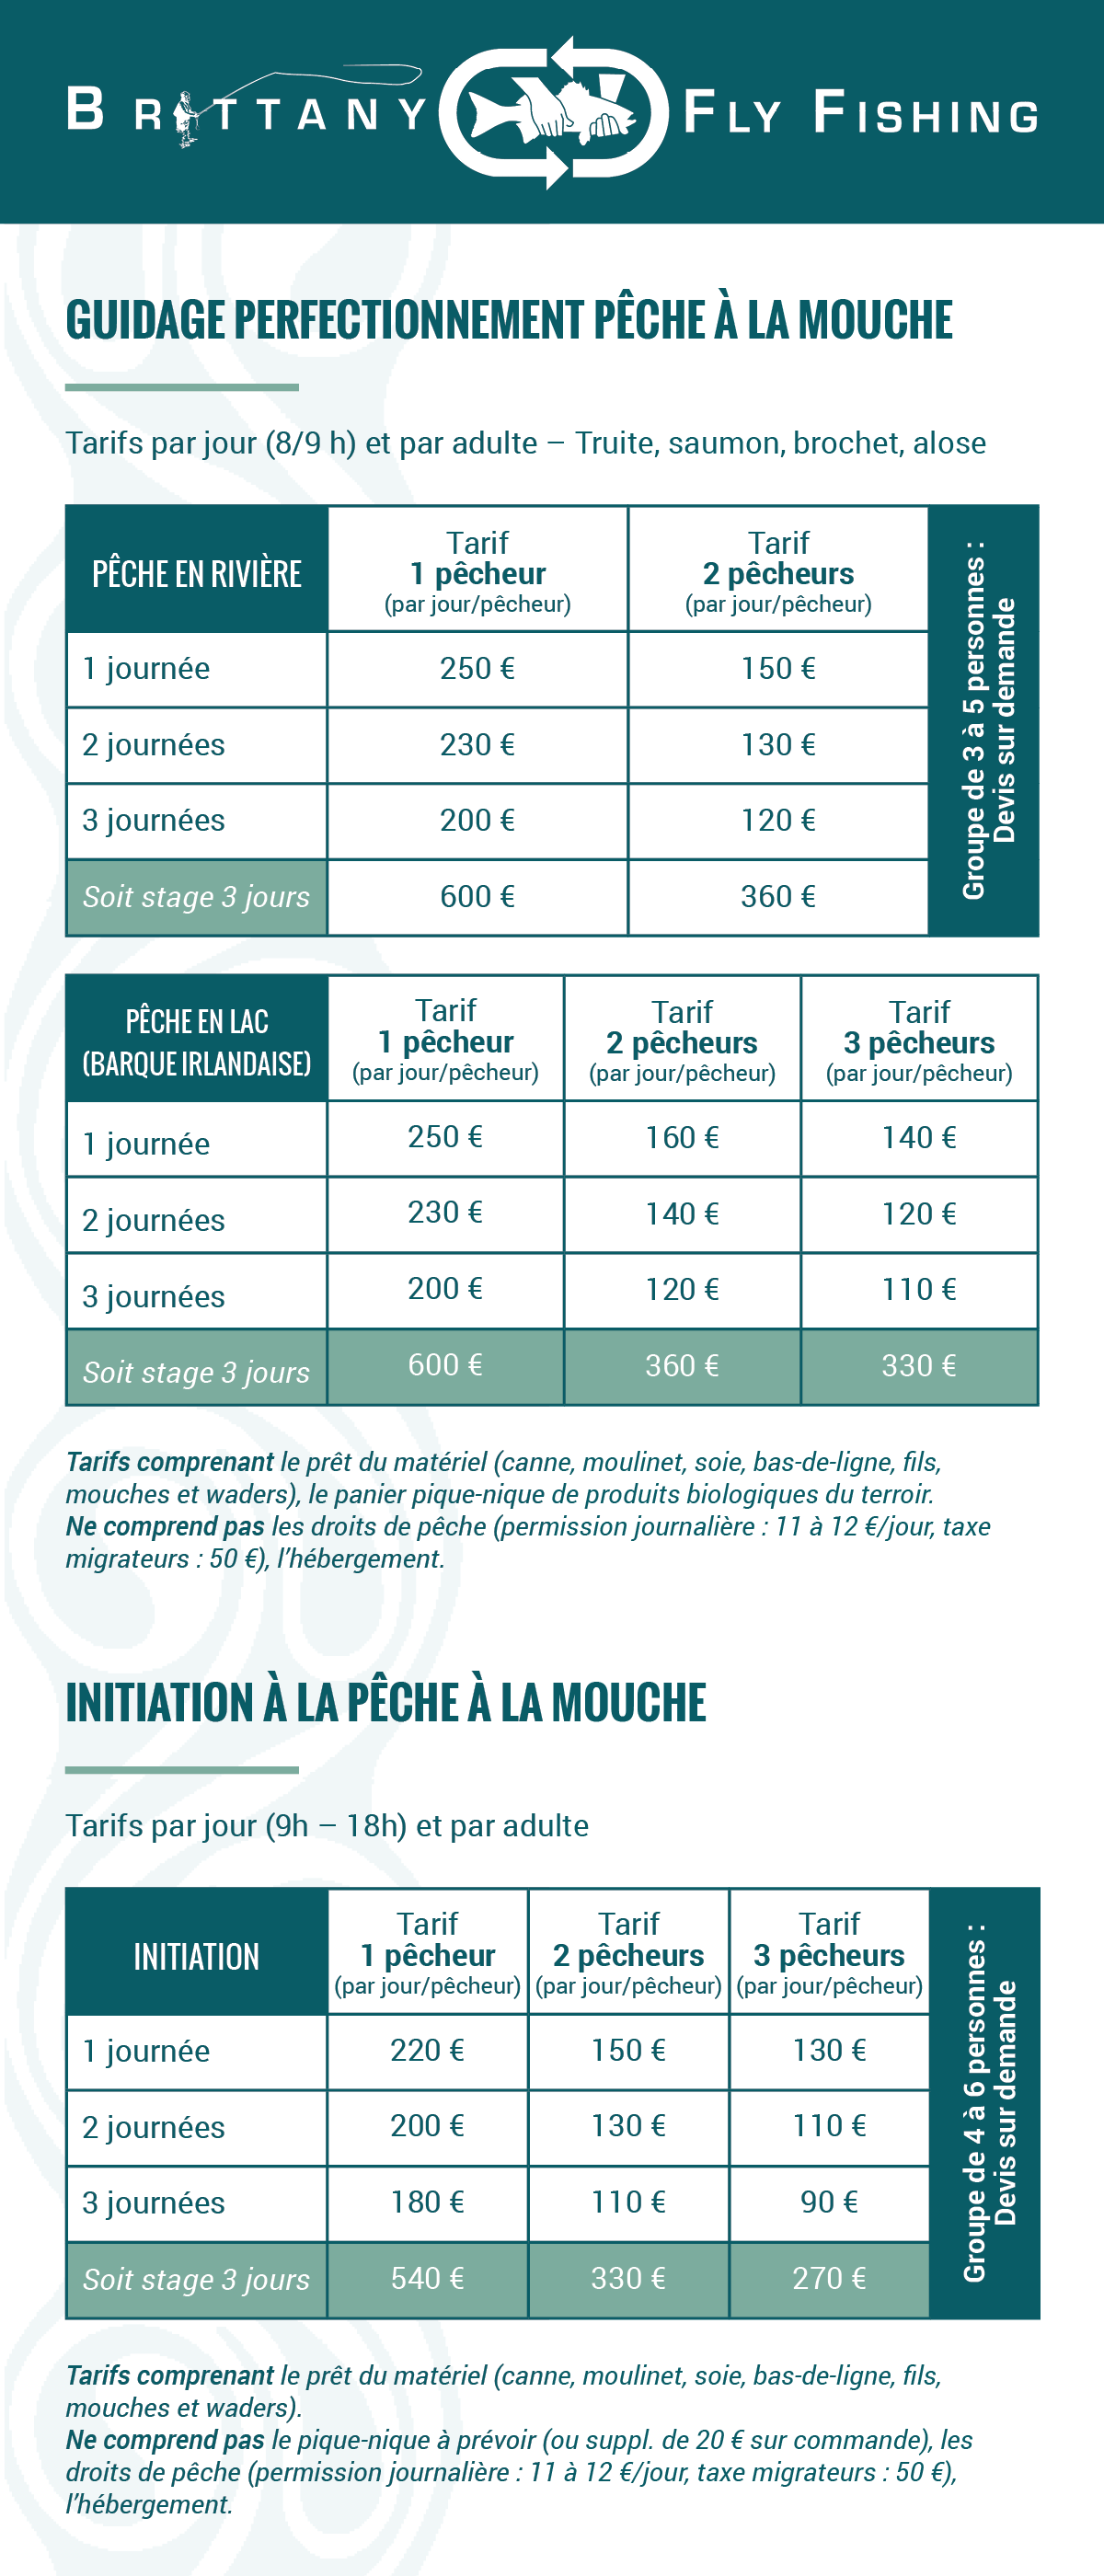 brittany-fly-fishing-tarifs-fr-2019